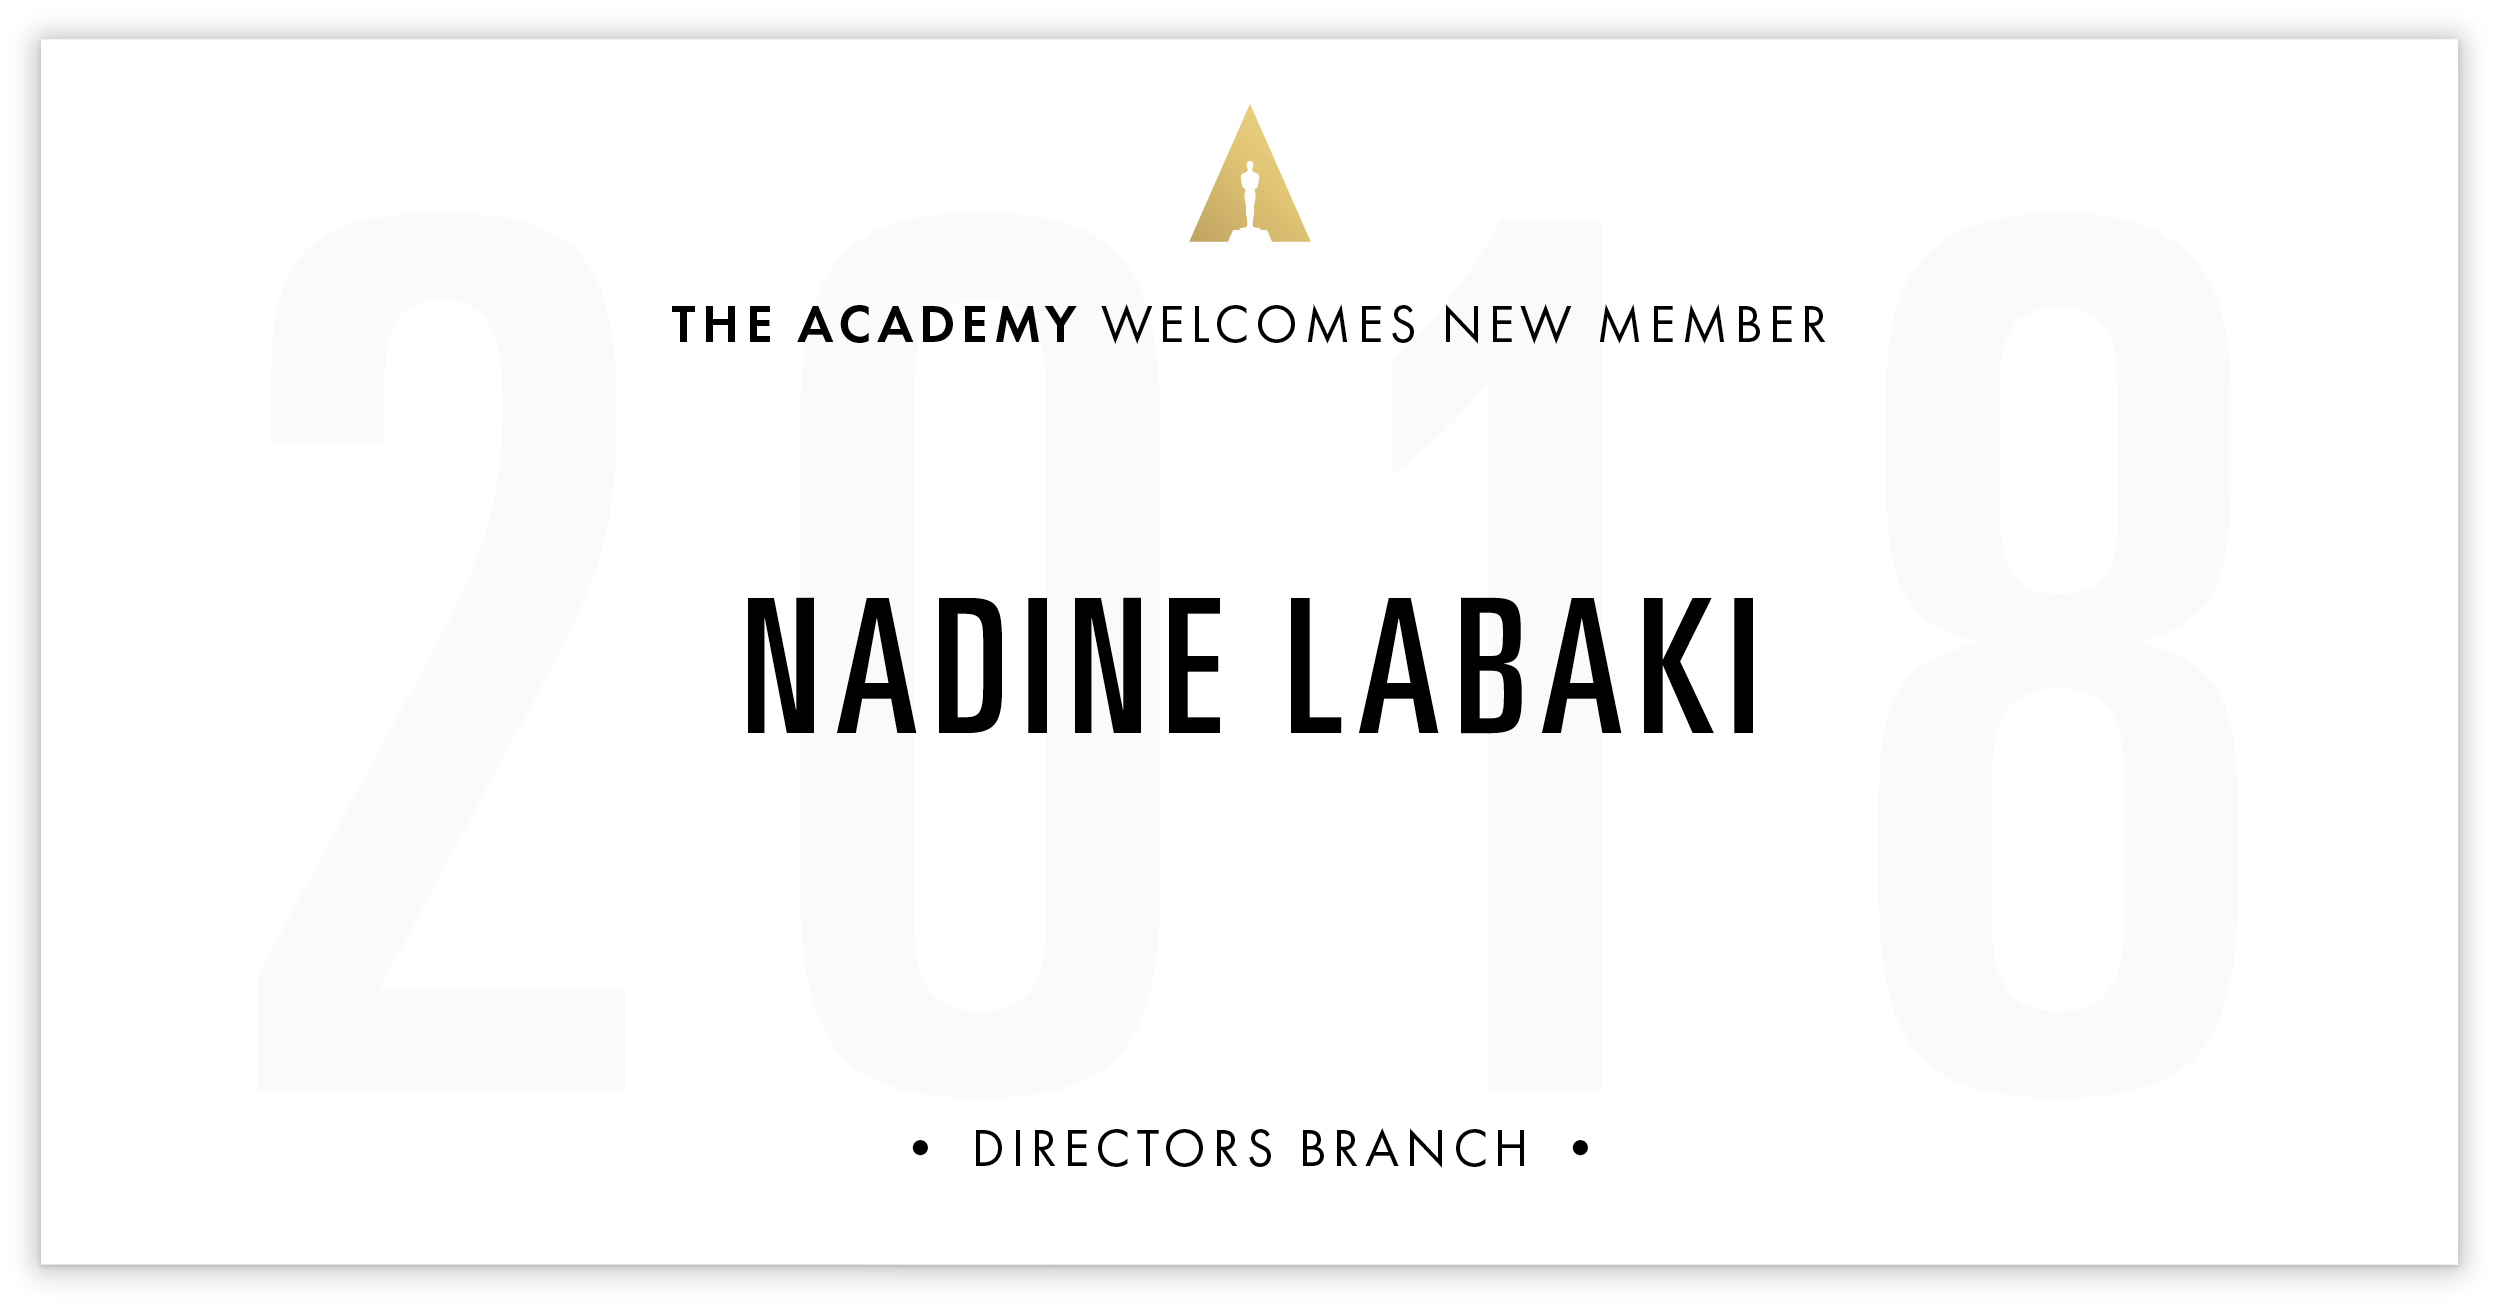 Nadine Labaki is invited!